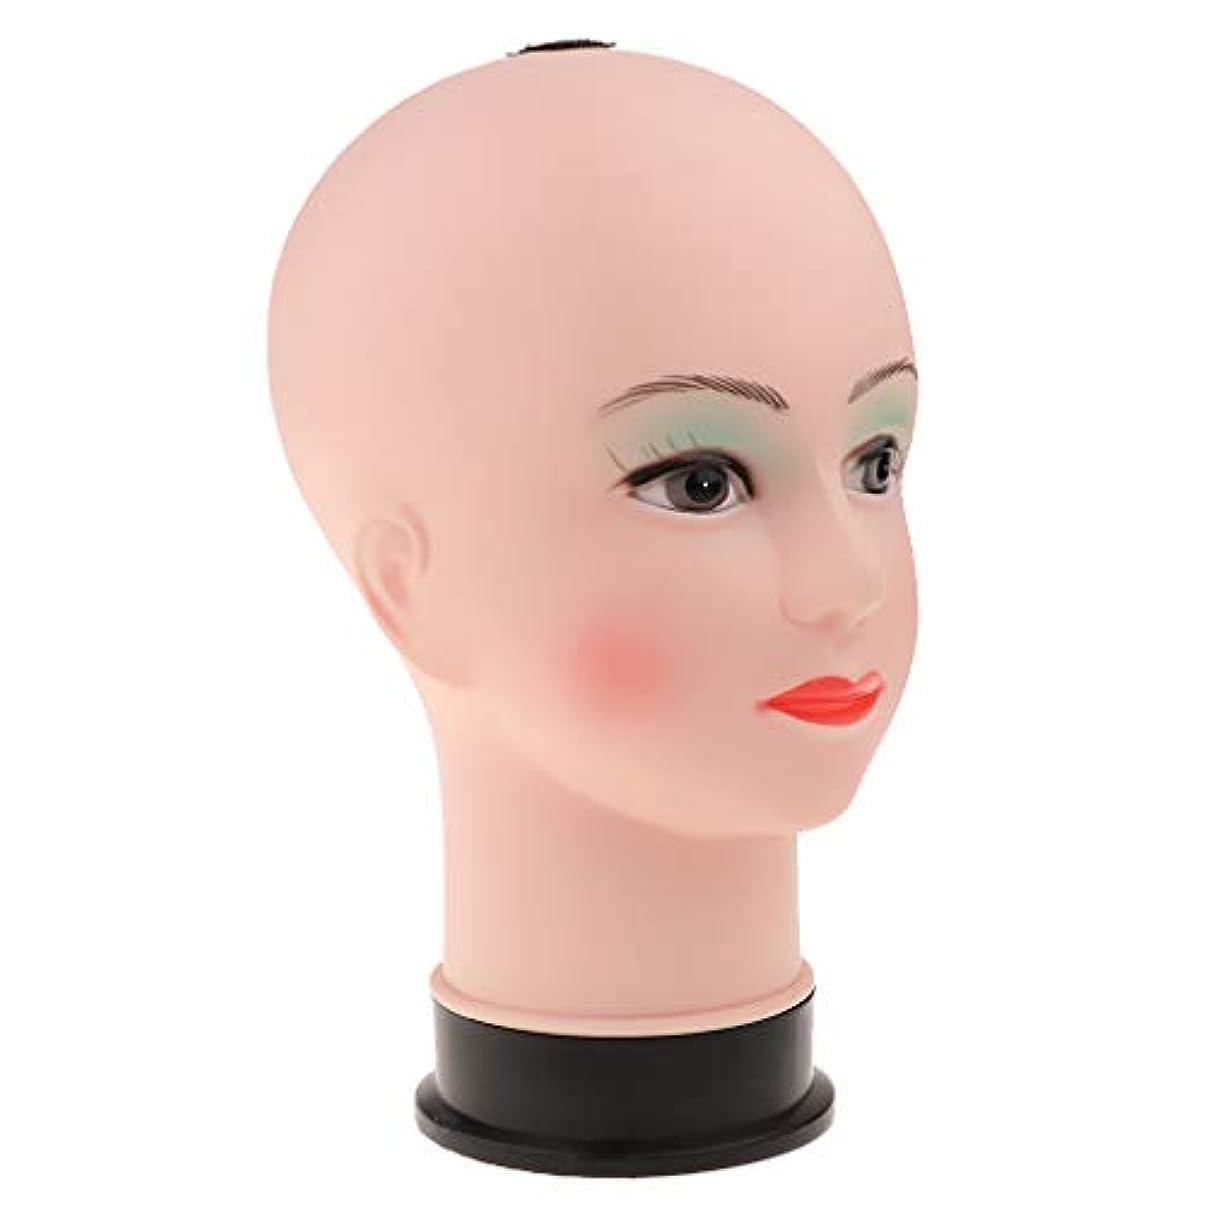 DYNWAVE マネキンヘッド ウィッグ 化粧練習 帽子 ジュエリー サングラス スカーフディスプレイ 全2色